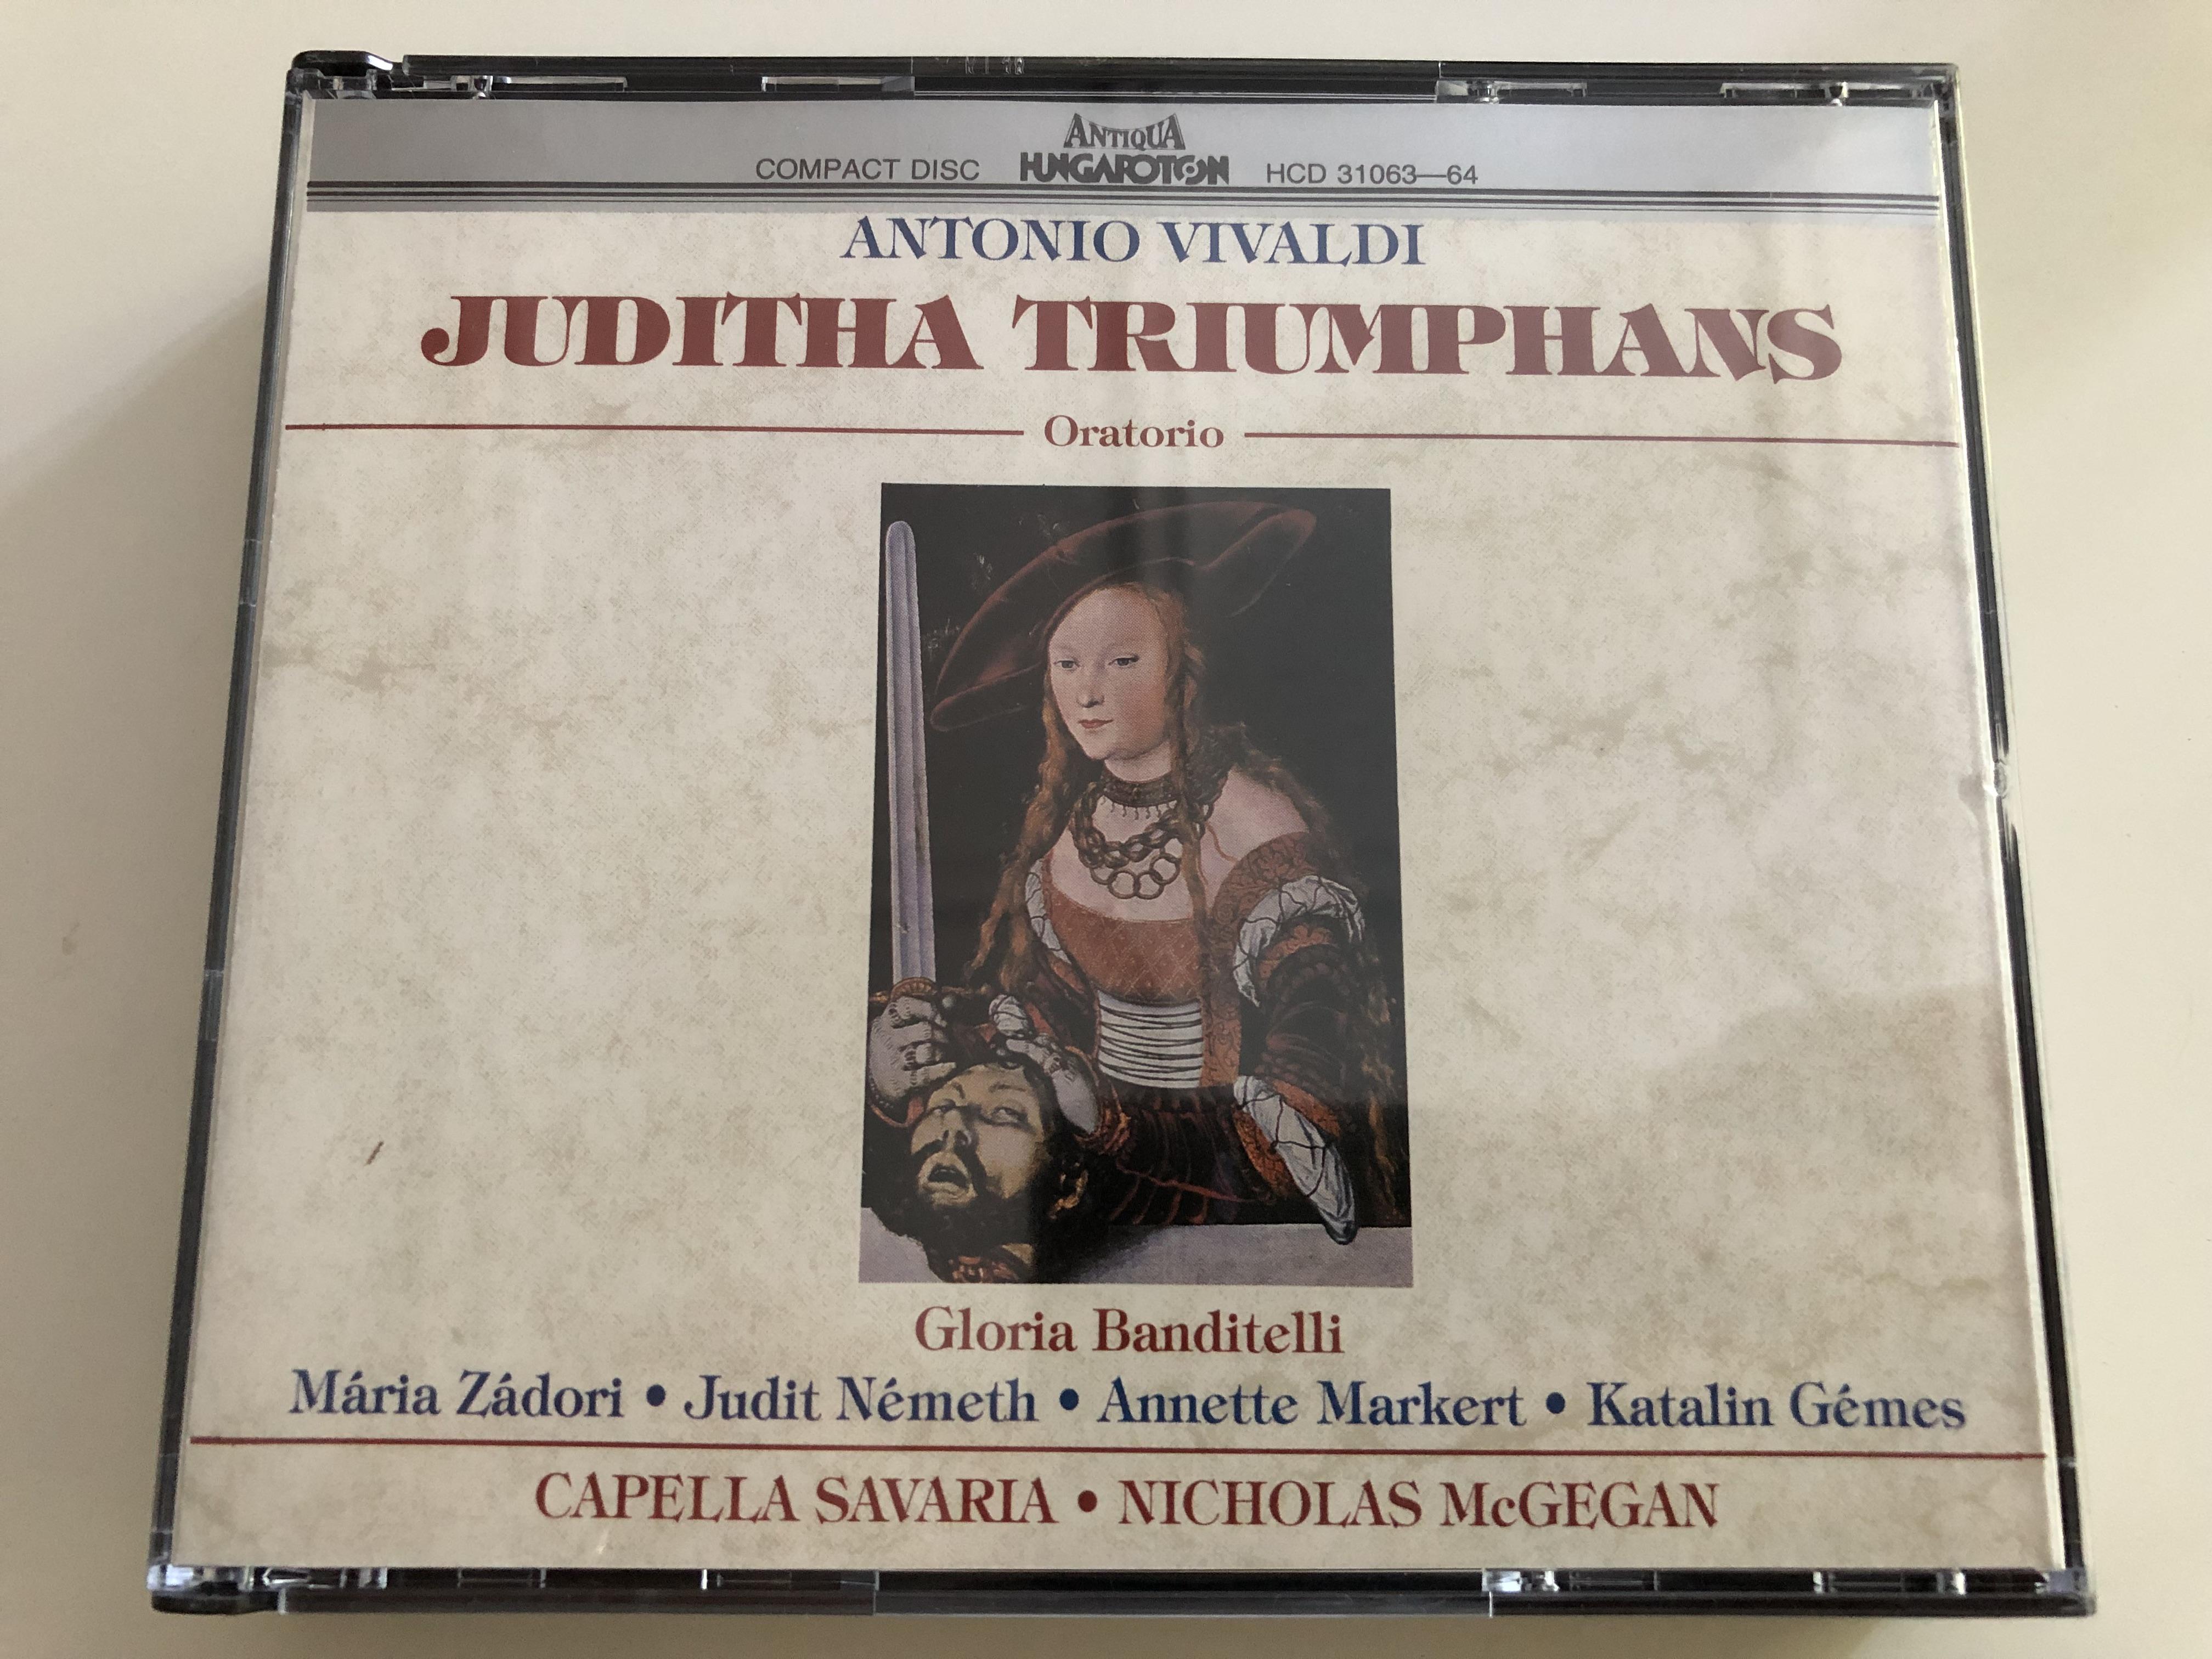 antonio-vivaldi-juditha-triumphans-oratorio-gloria-banditelli-m-ria-z-dori-judit-n-meth-annette-markert-katalin-g-mes-capella-savaria-leader-nicholas-mcgegan-audio-cd-set-hcd-31063-64-1-.jpg